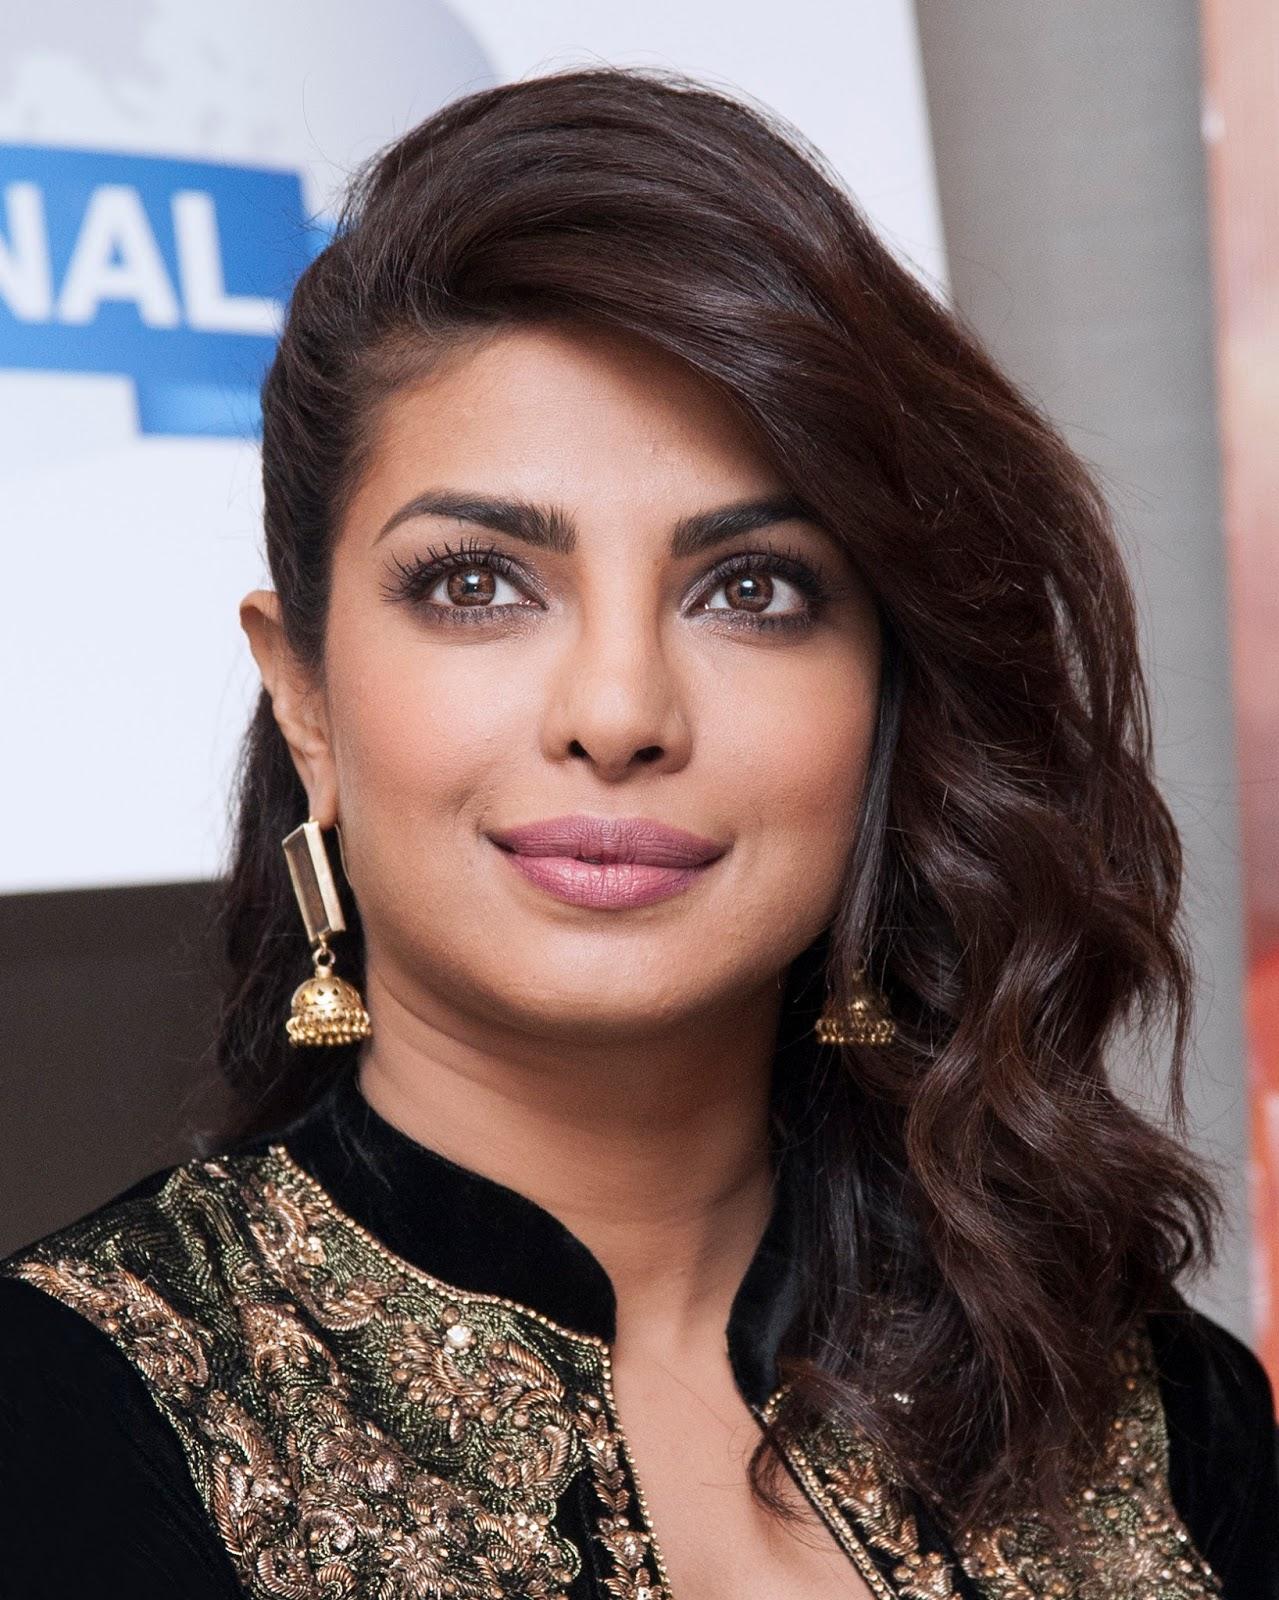 Priyanka Chopra Latest Hot Photos In Black Dress